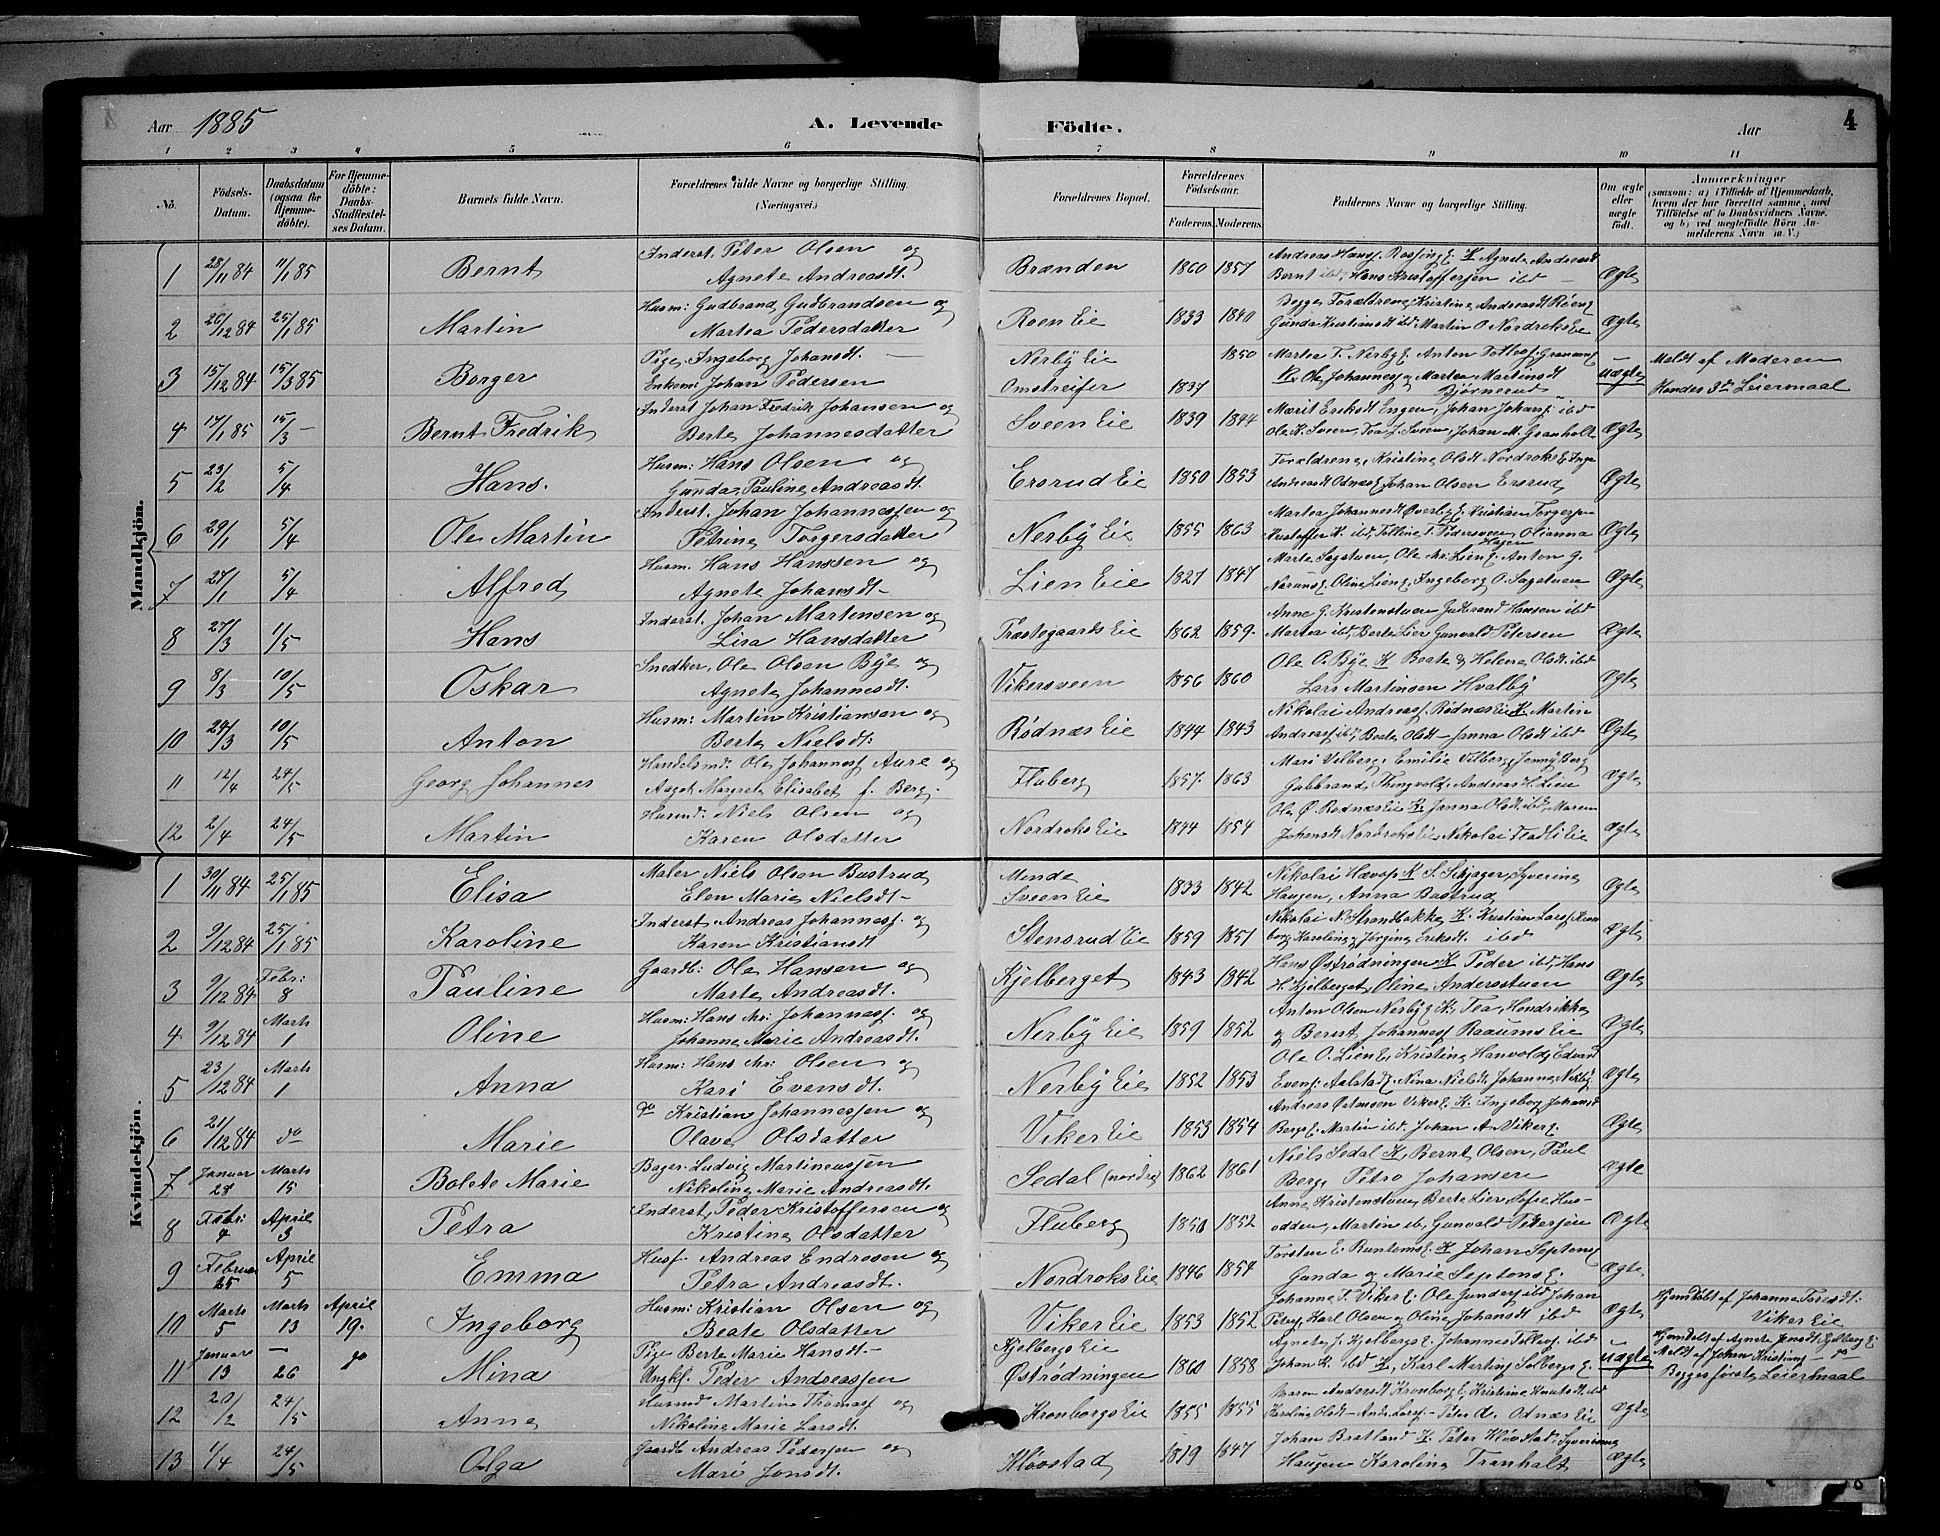 SAH, Søndre Land prestekontor, L/L0003: Klokkerbok nr. 3, 1884-1902, s. 4